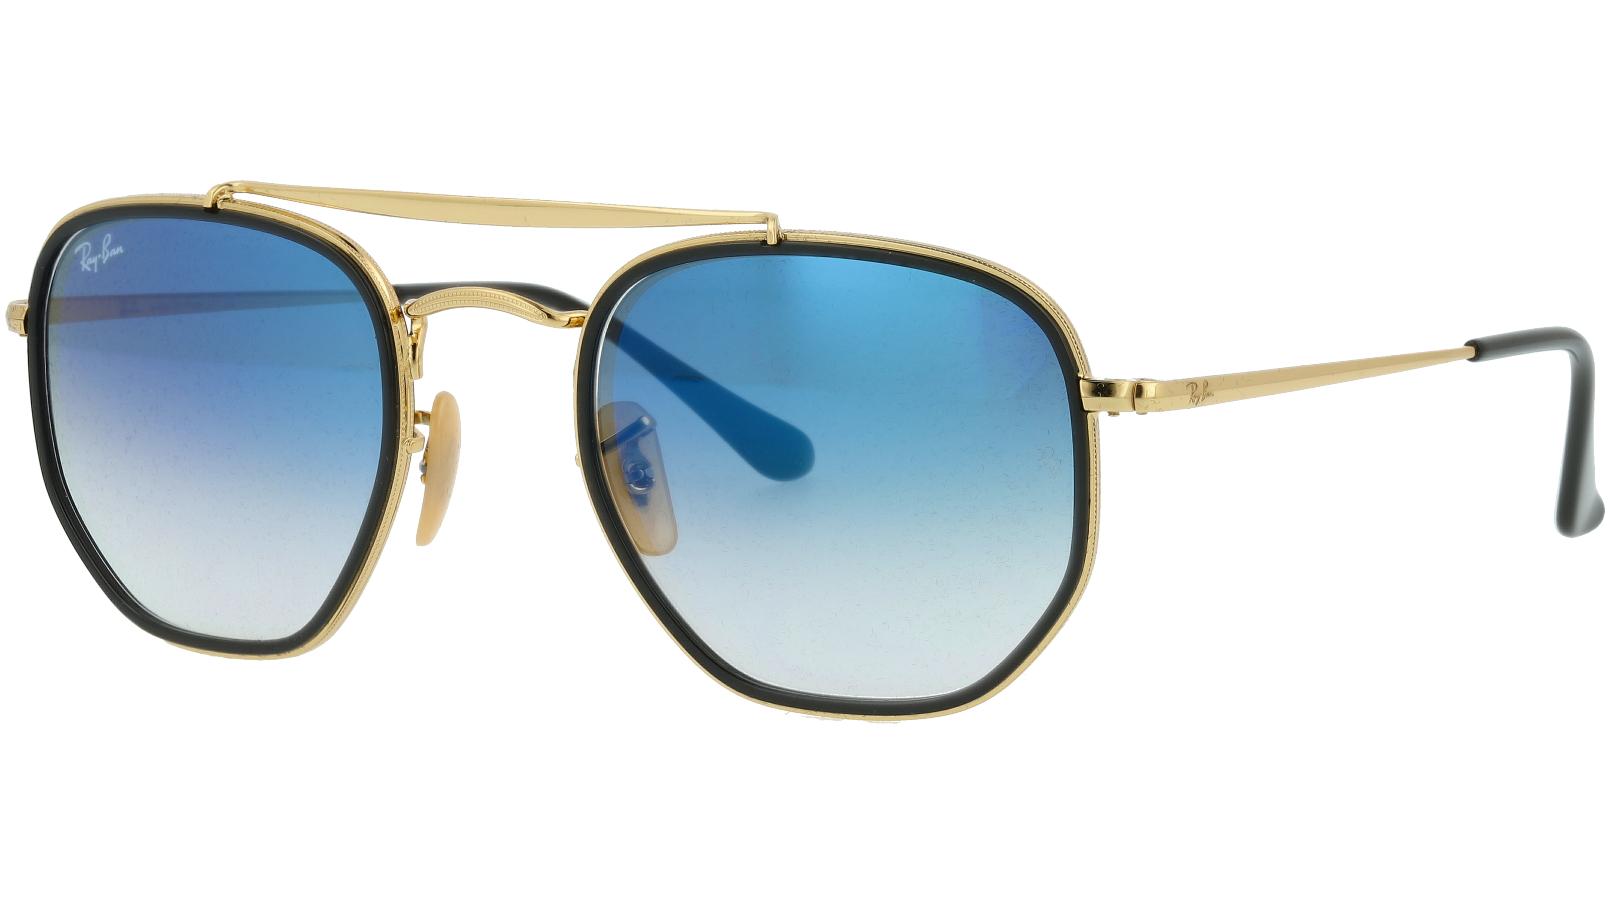 Ray-Ban RB3648M 91673F 52 Arista Sunglasses